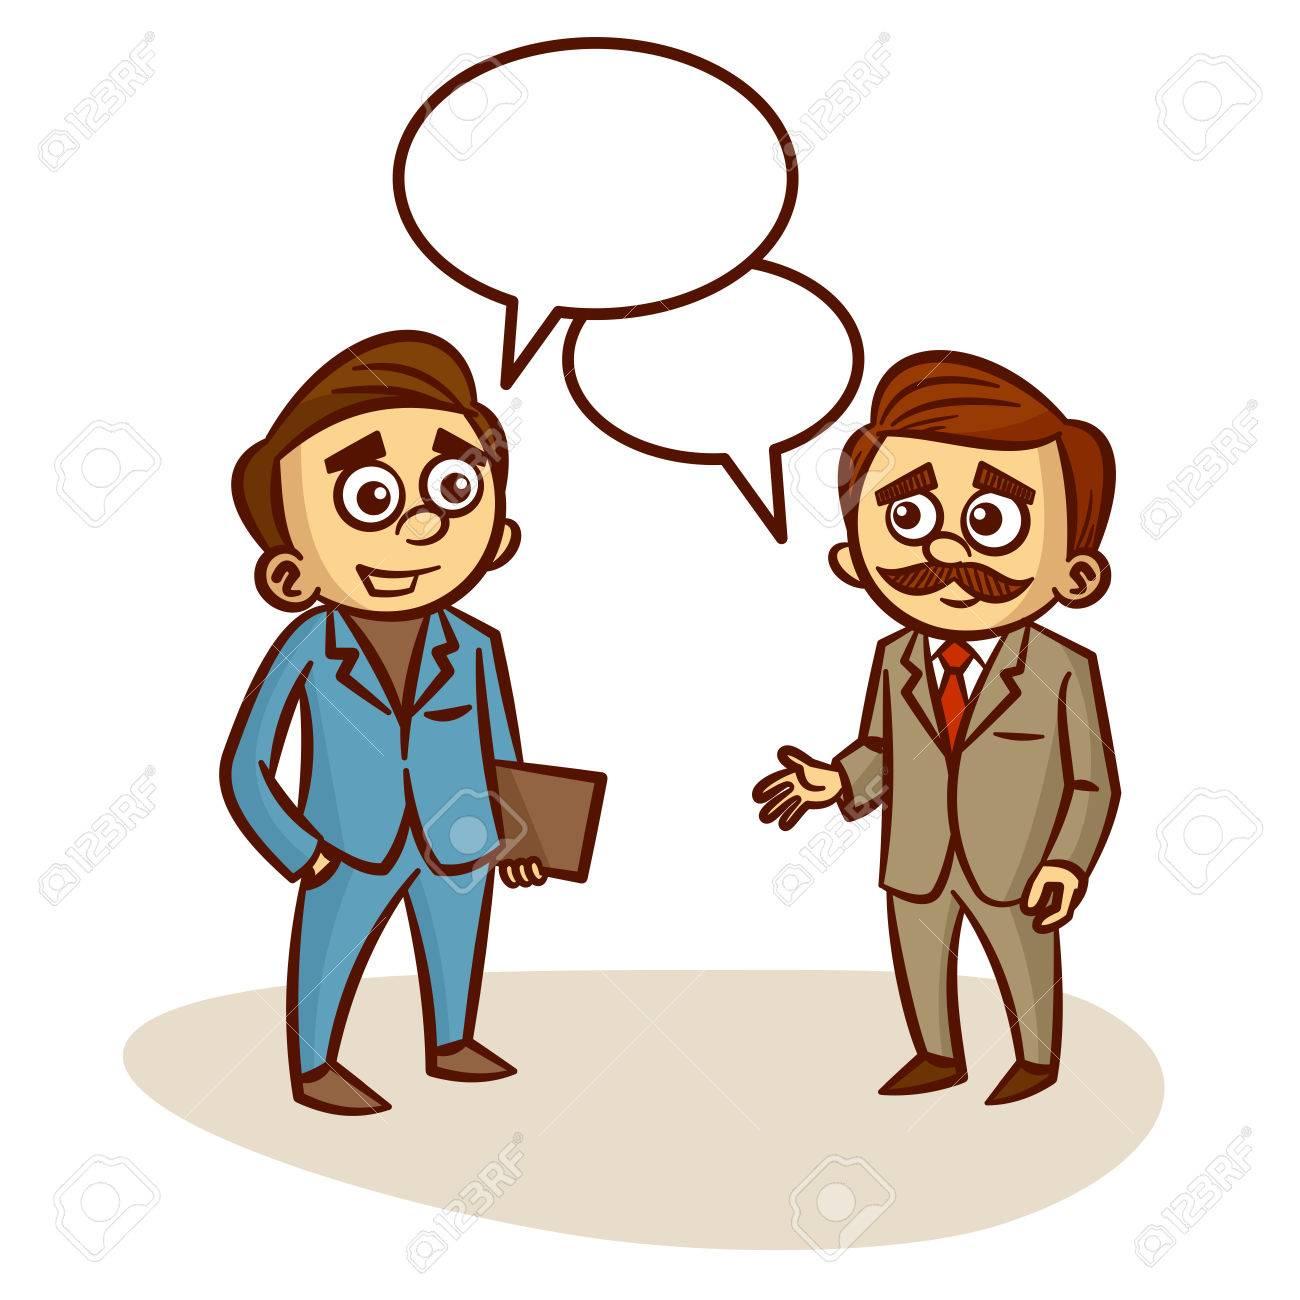 Talking Clipart at GetDrawings.com.